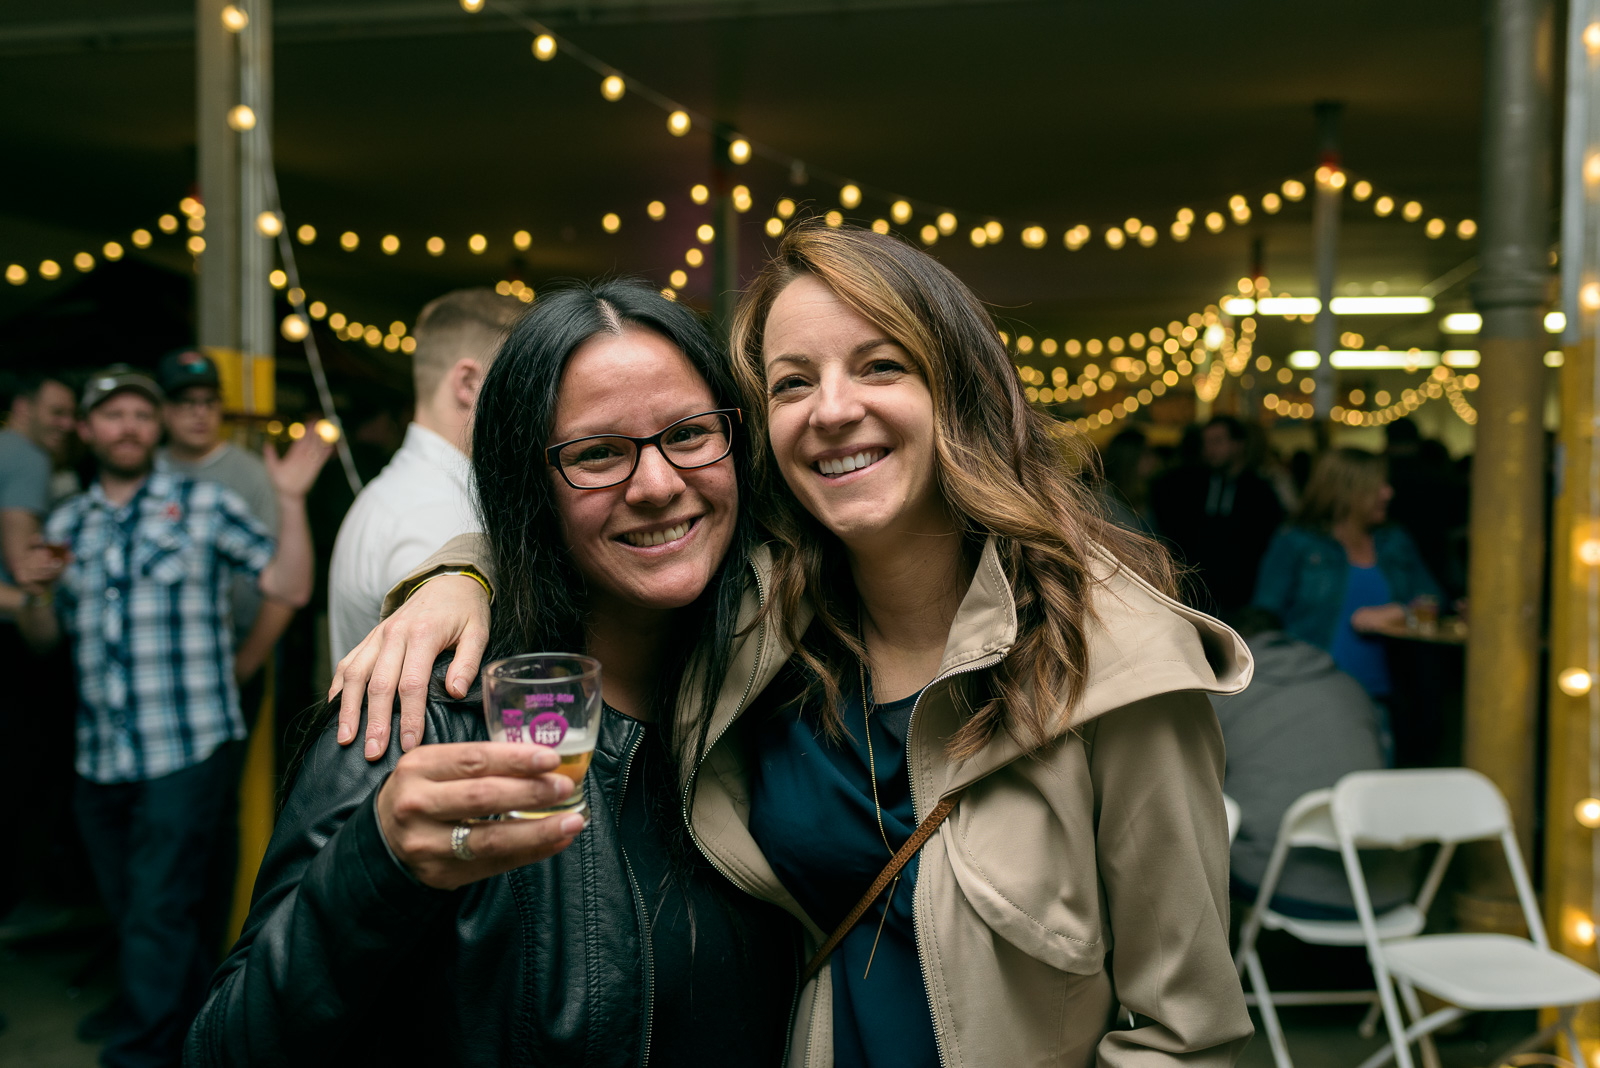 brewha-caskfest-blog-32.jpg